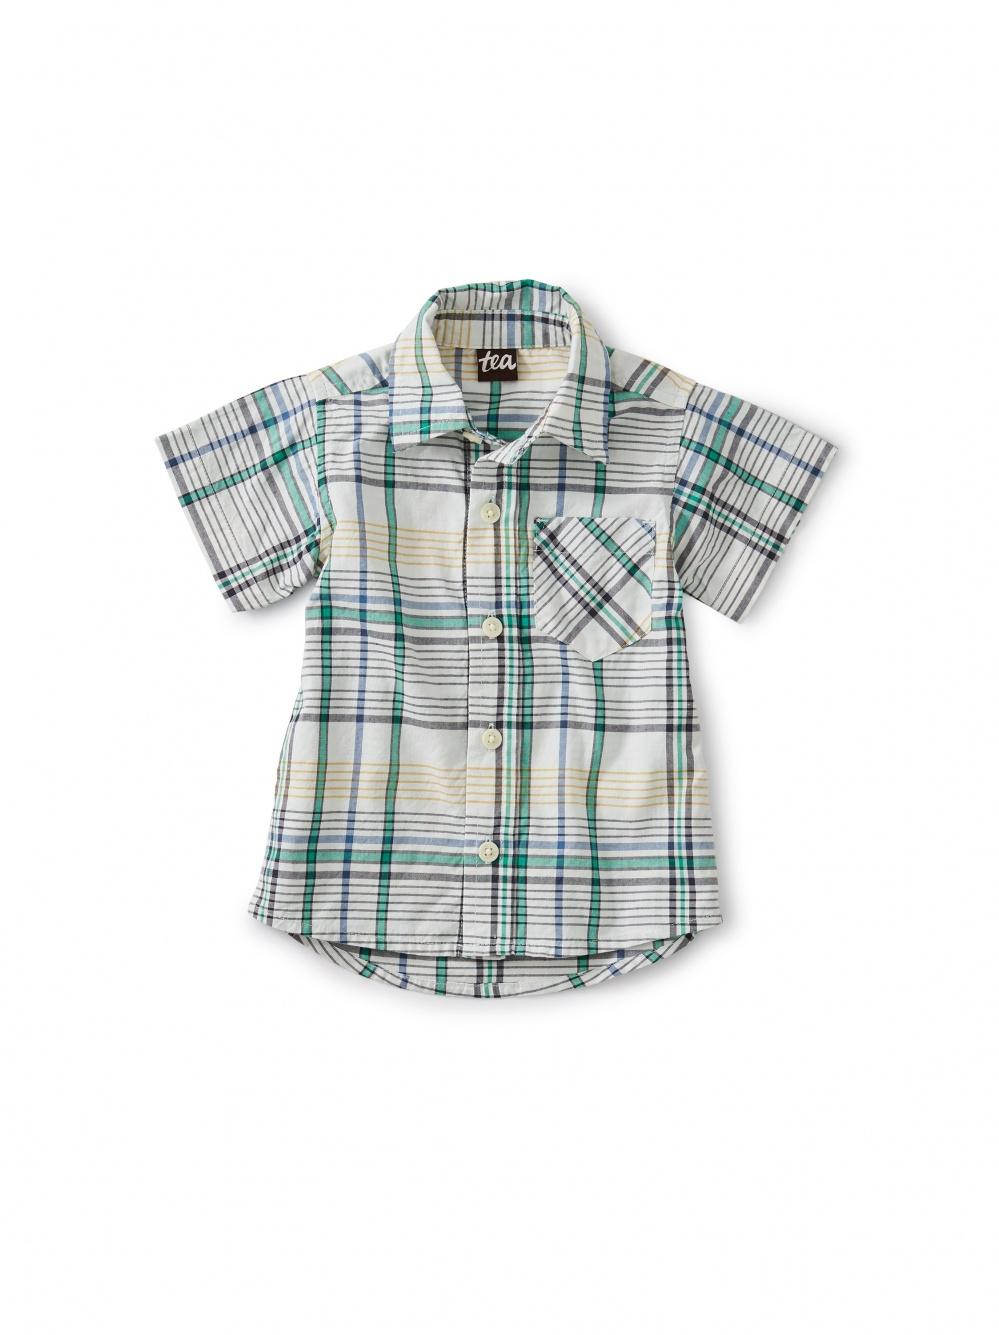 Madras Woven Baby Shirt